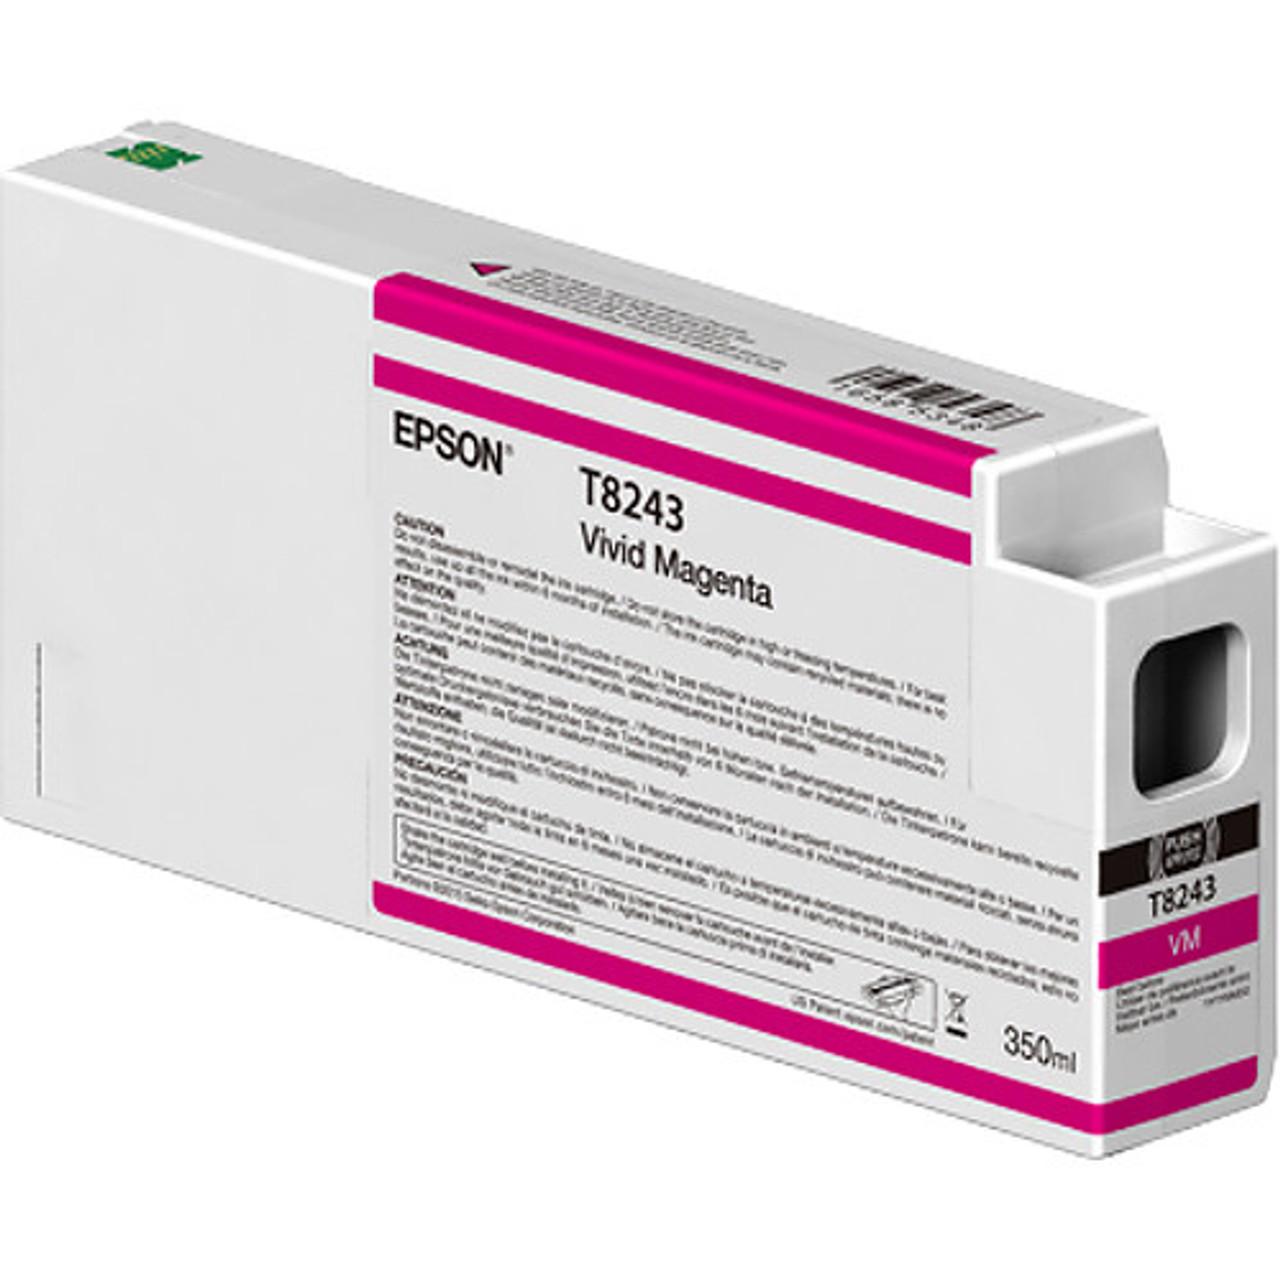 Epson T824300 Vivid Magenta Ink Cartridge, 350 mL